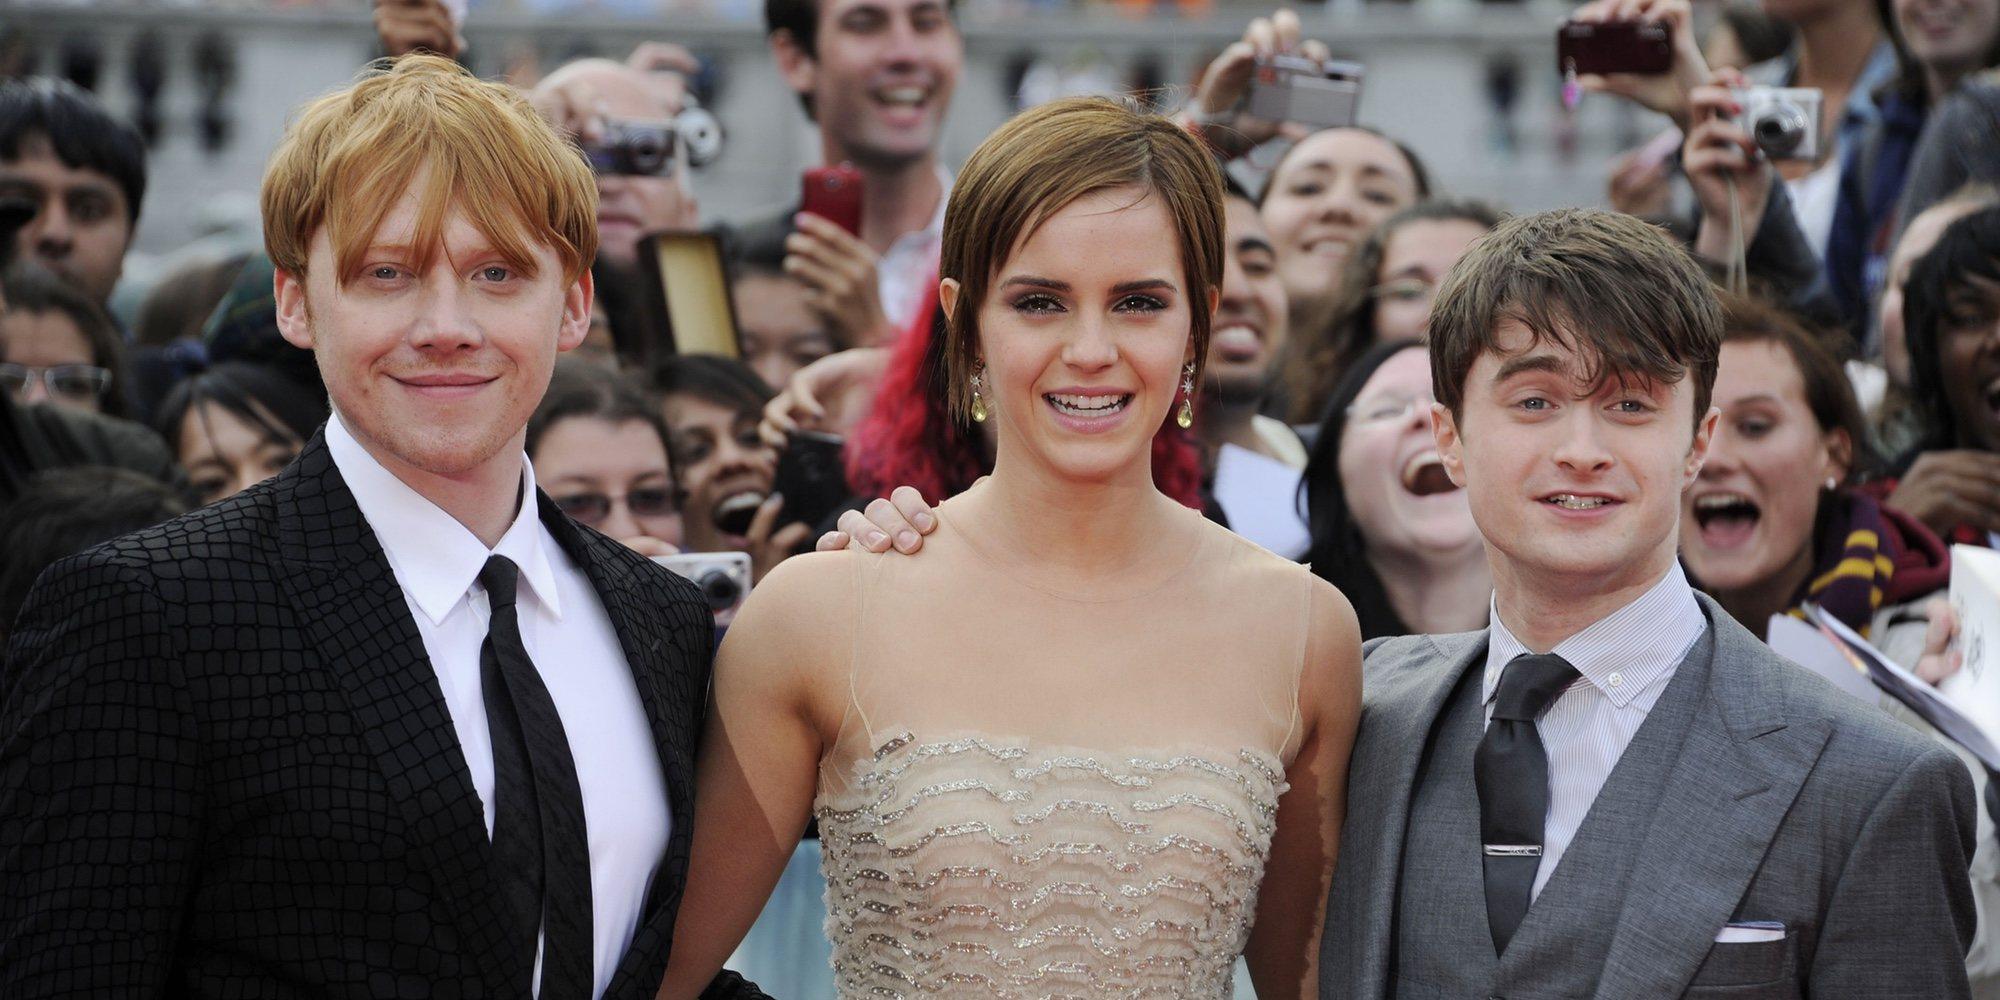 Daniel Radcliffe explica por qué no va a ir a ver la obra de teatro de 'Harry Potter'